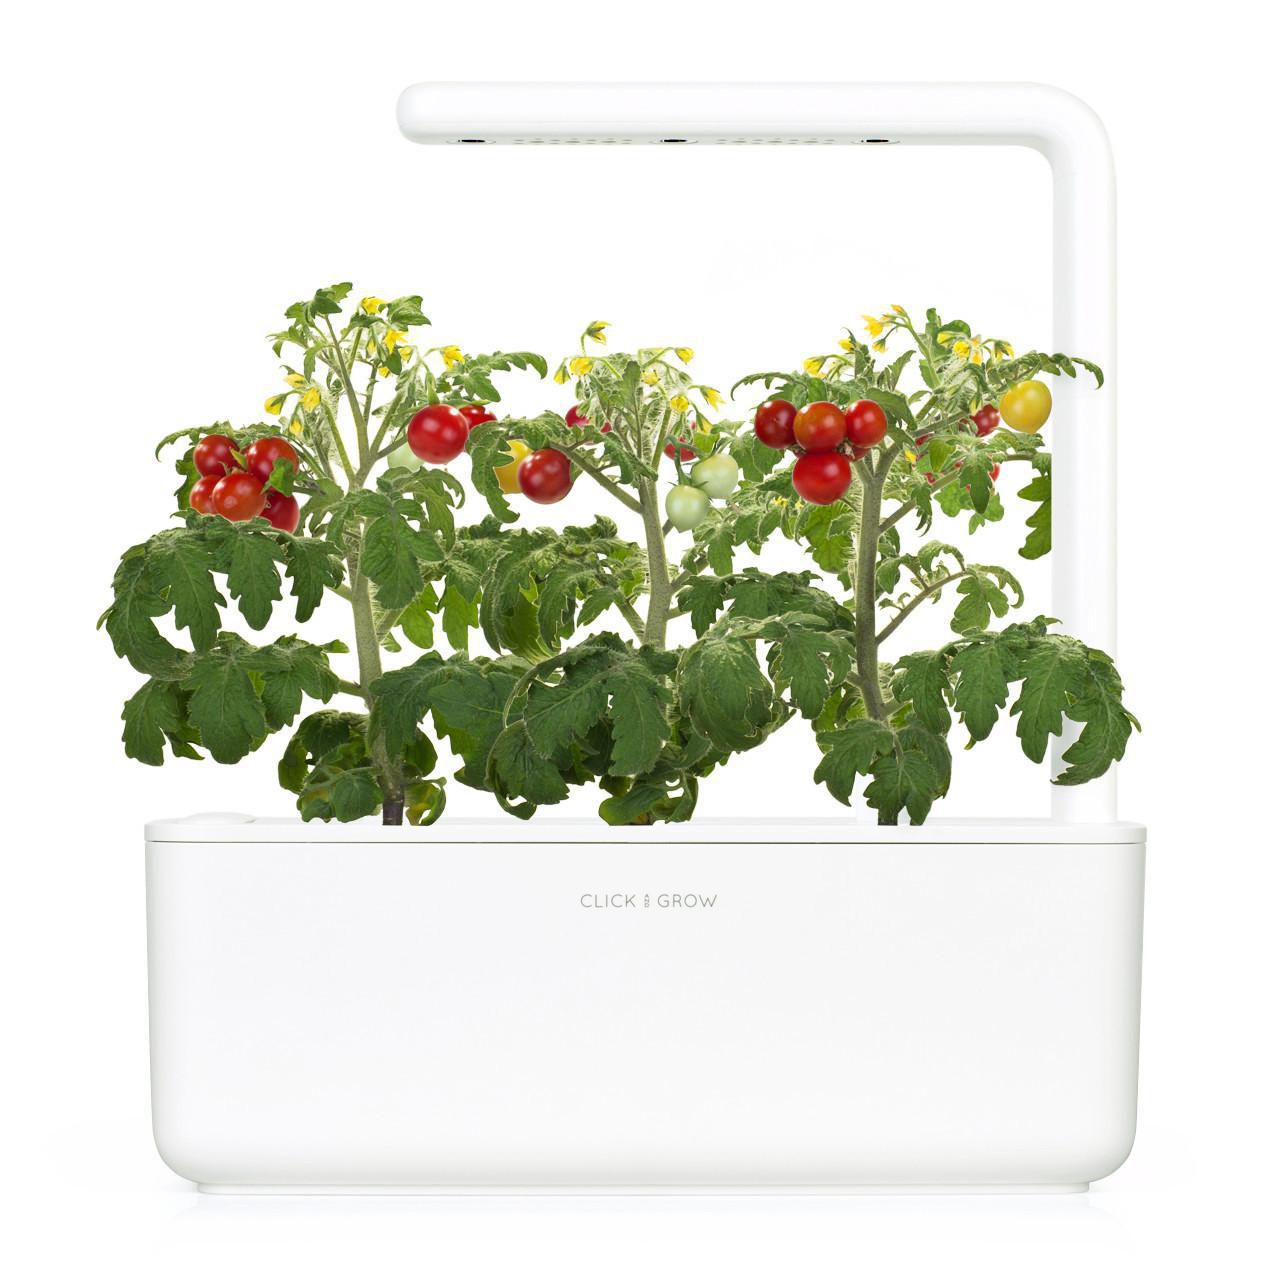 Full Size of Click And Grow Krutertopf Smart Garden 3 Weiss Kräutertopf Küche Wohnzimmer Kräutertopf